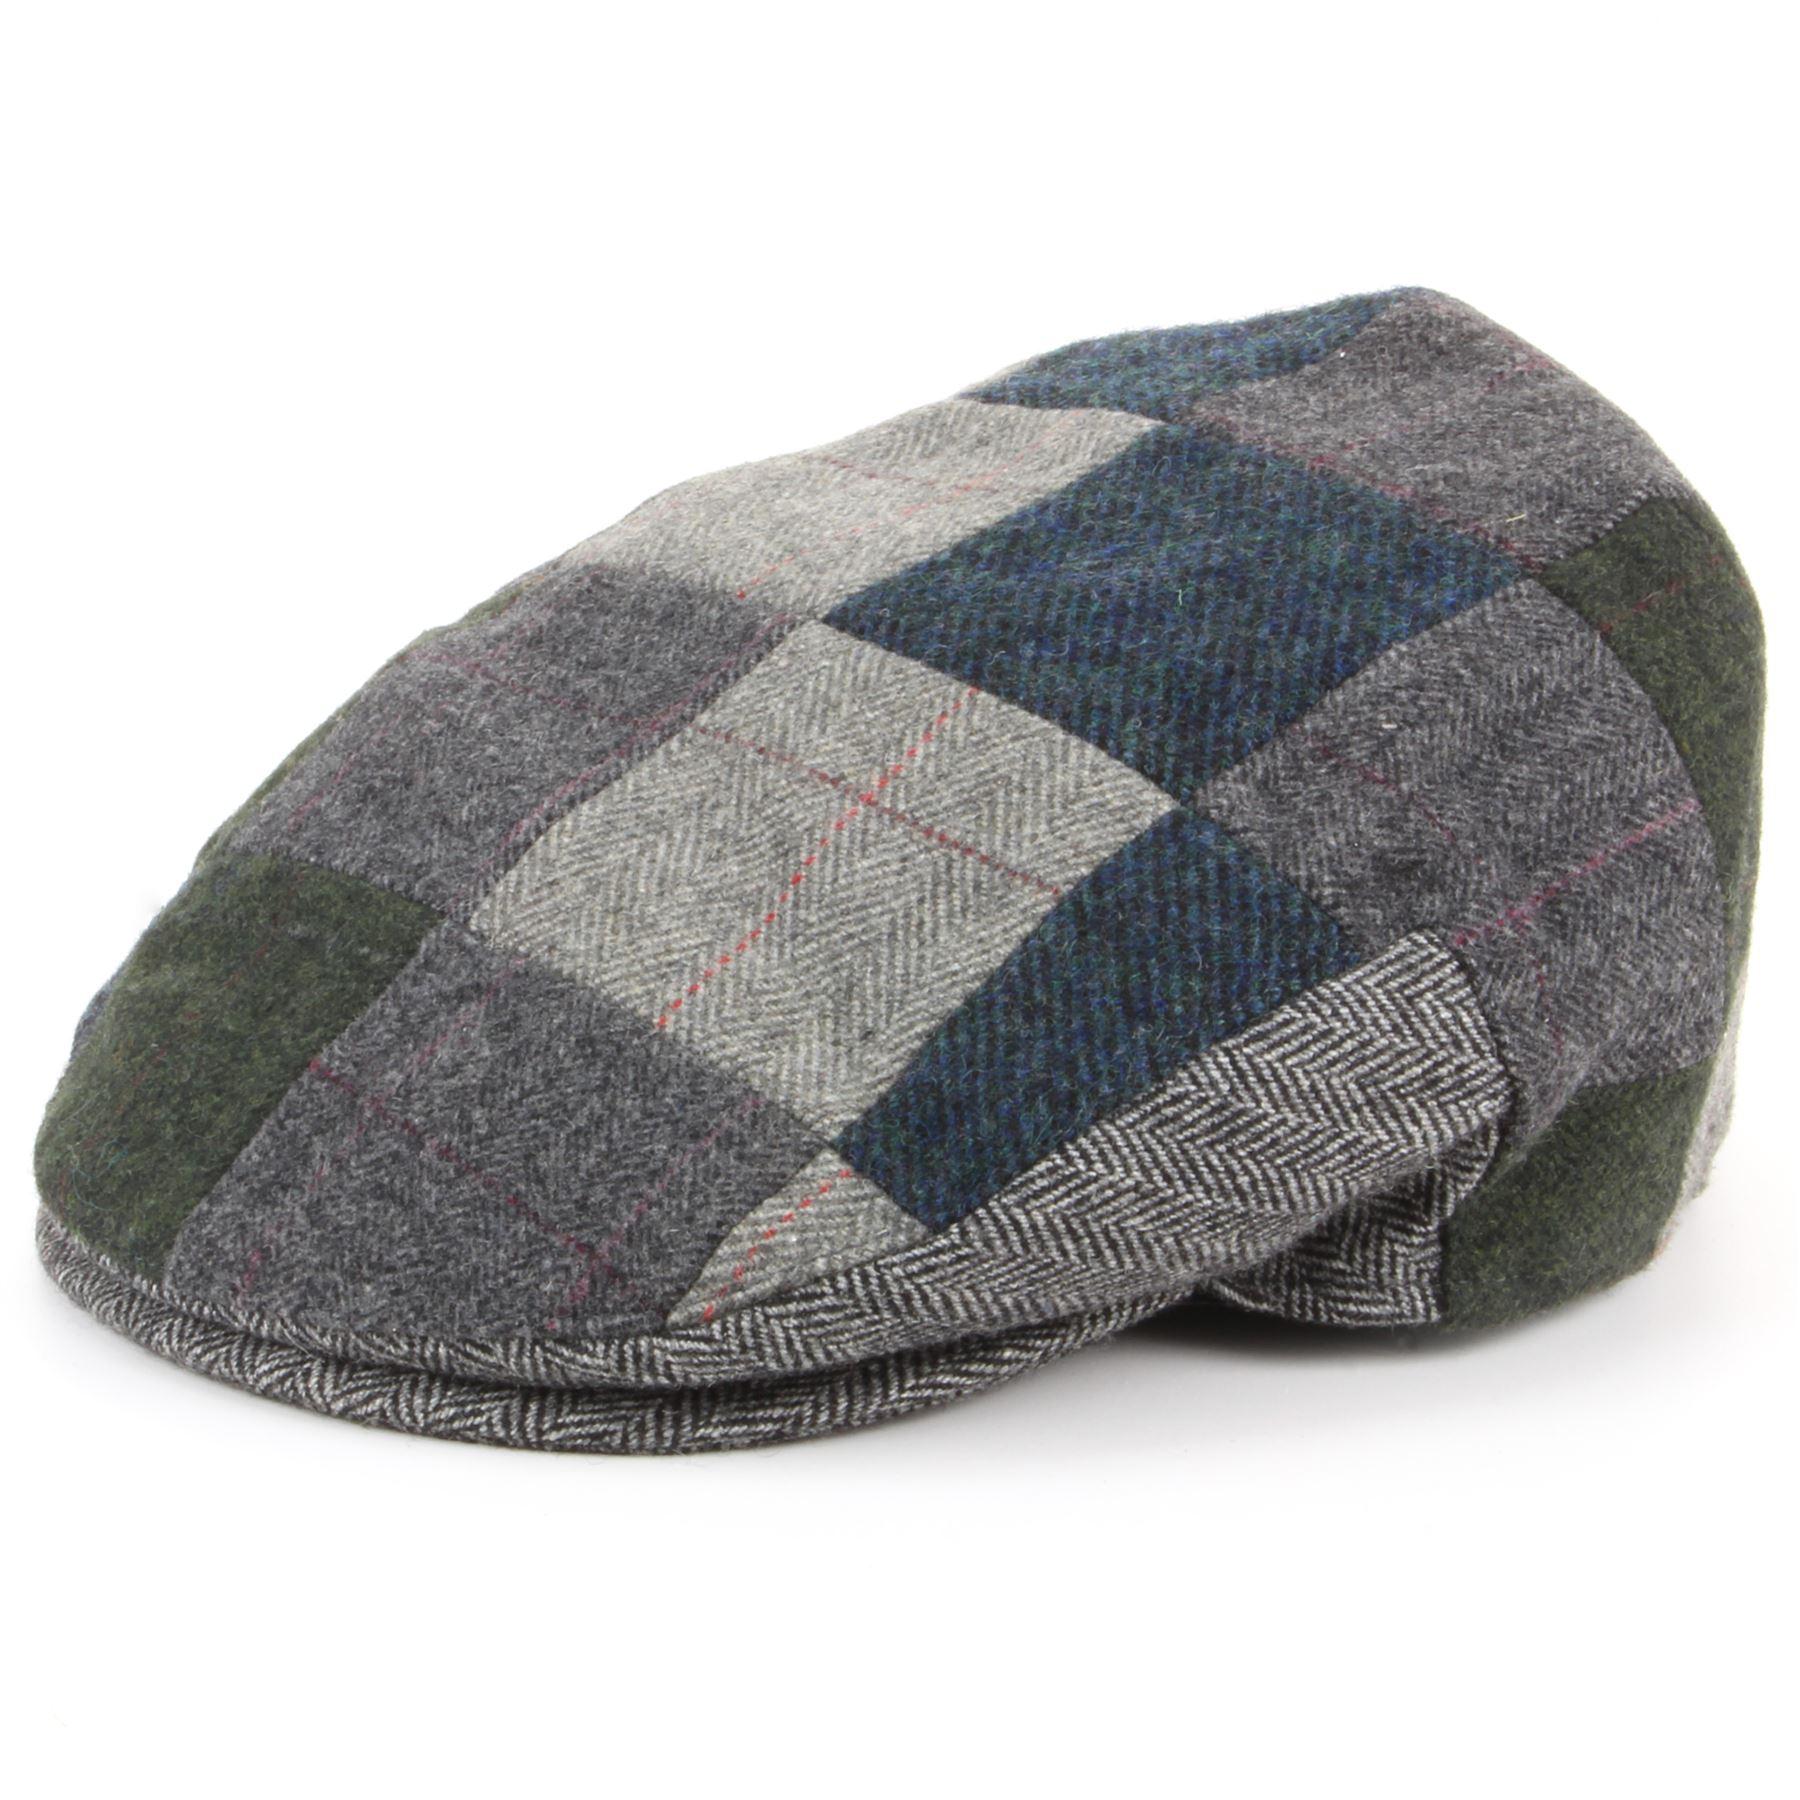 Hat Patchwork Tweed Flat Cap Blue Brown New Winter Hunting Walking Warm